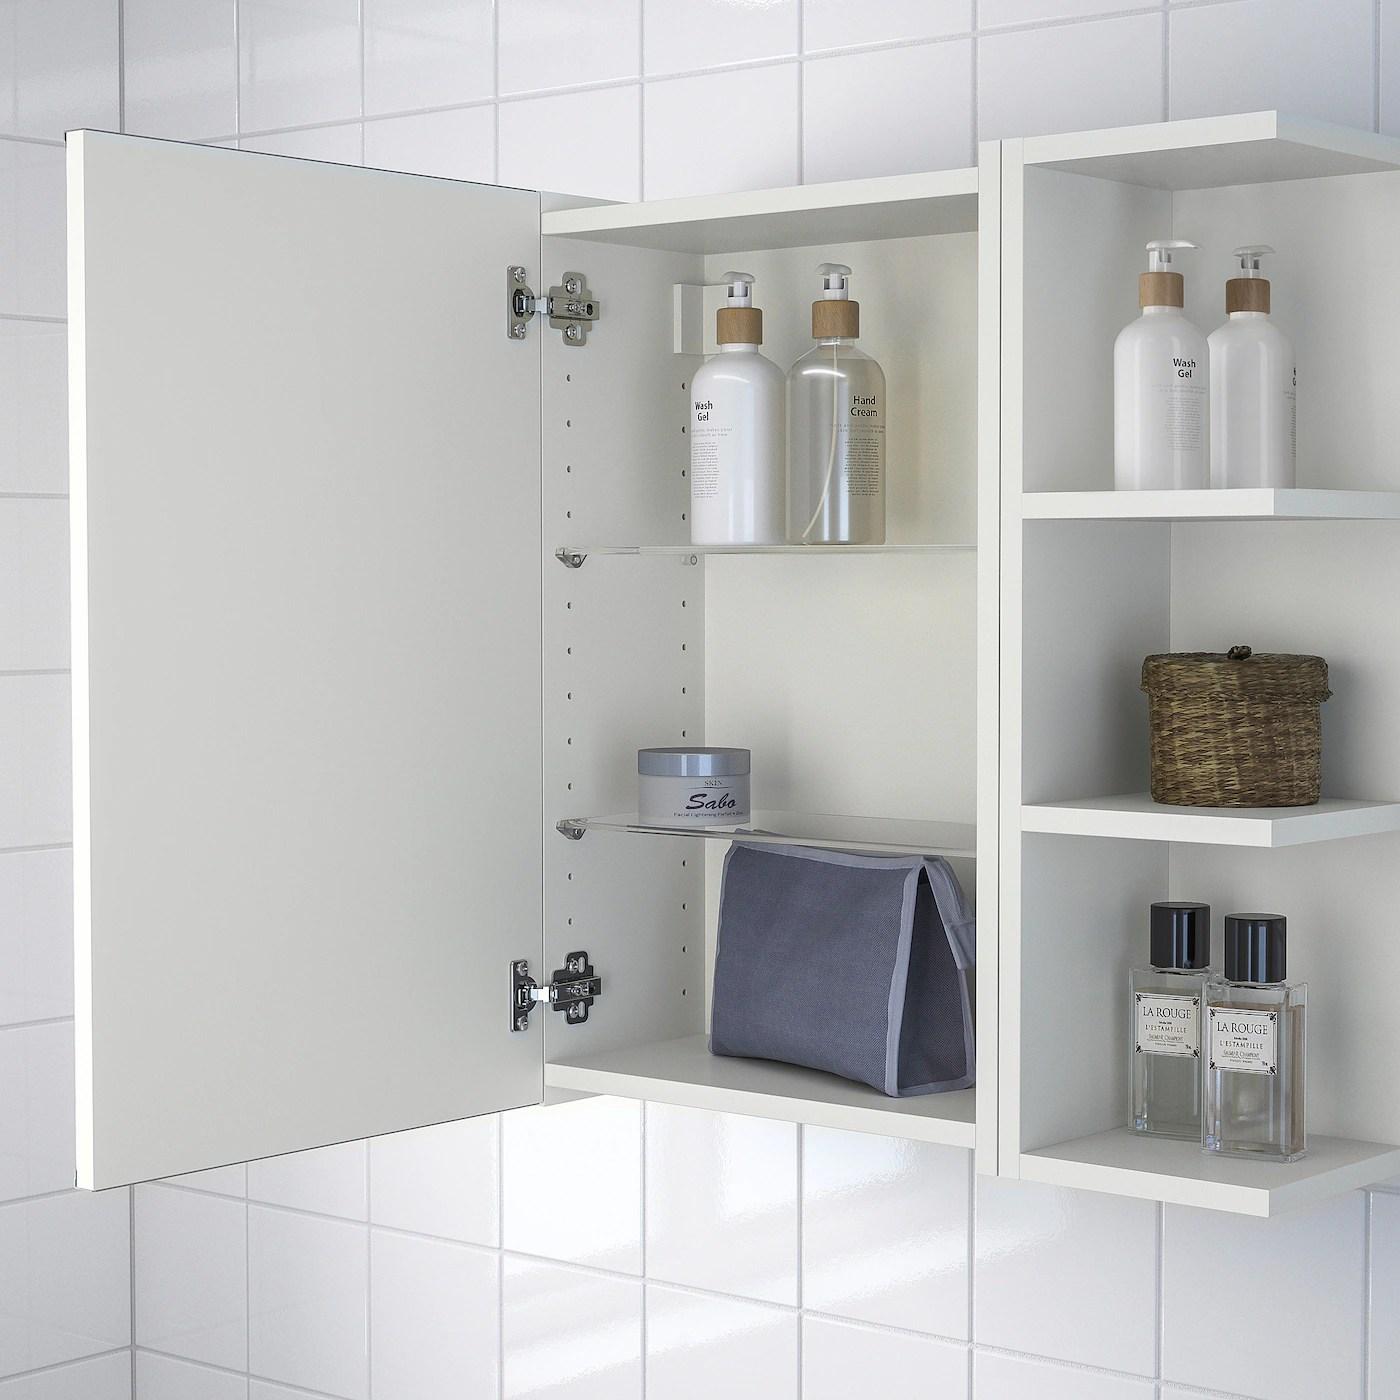 Lillangen Element Miroir 1pte 2etag Fin Blanc 78x21x64cm Magasinez Chez Ikea Ikea